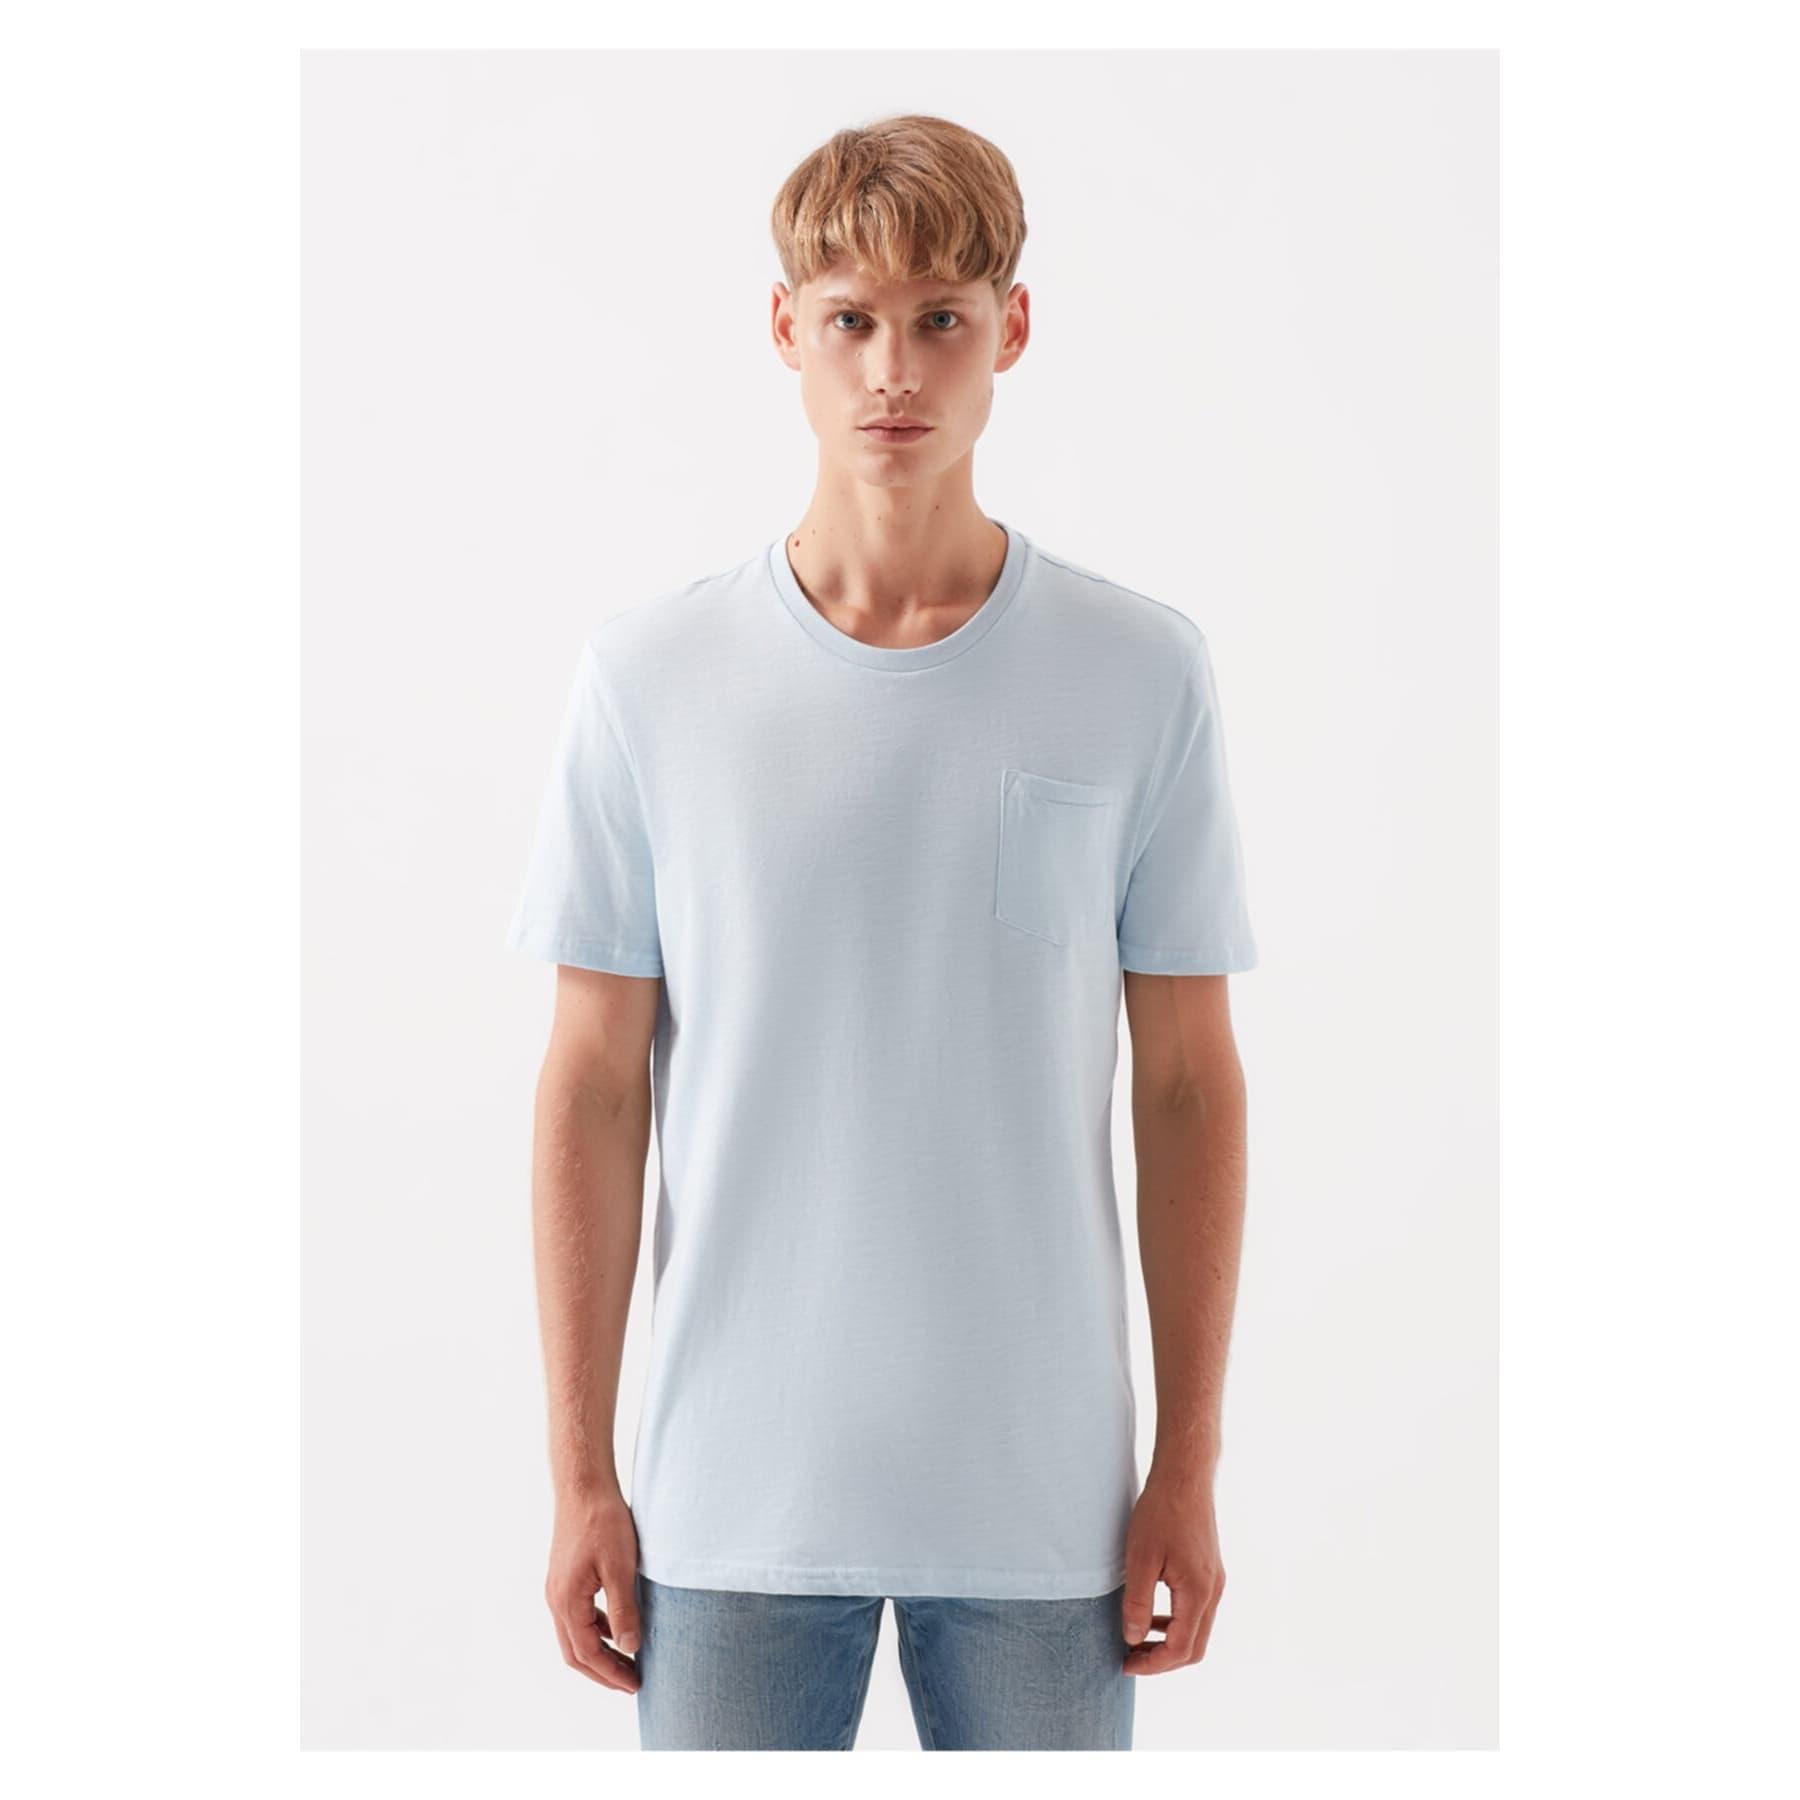 Basic Bisiklet Yaka Erkek Mavi Tişört